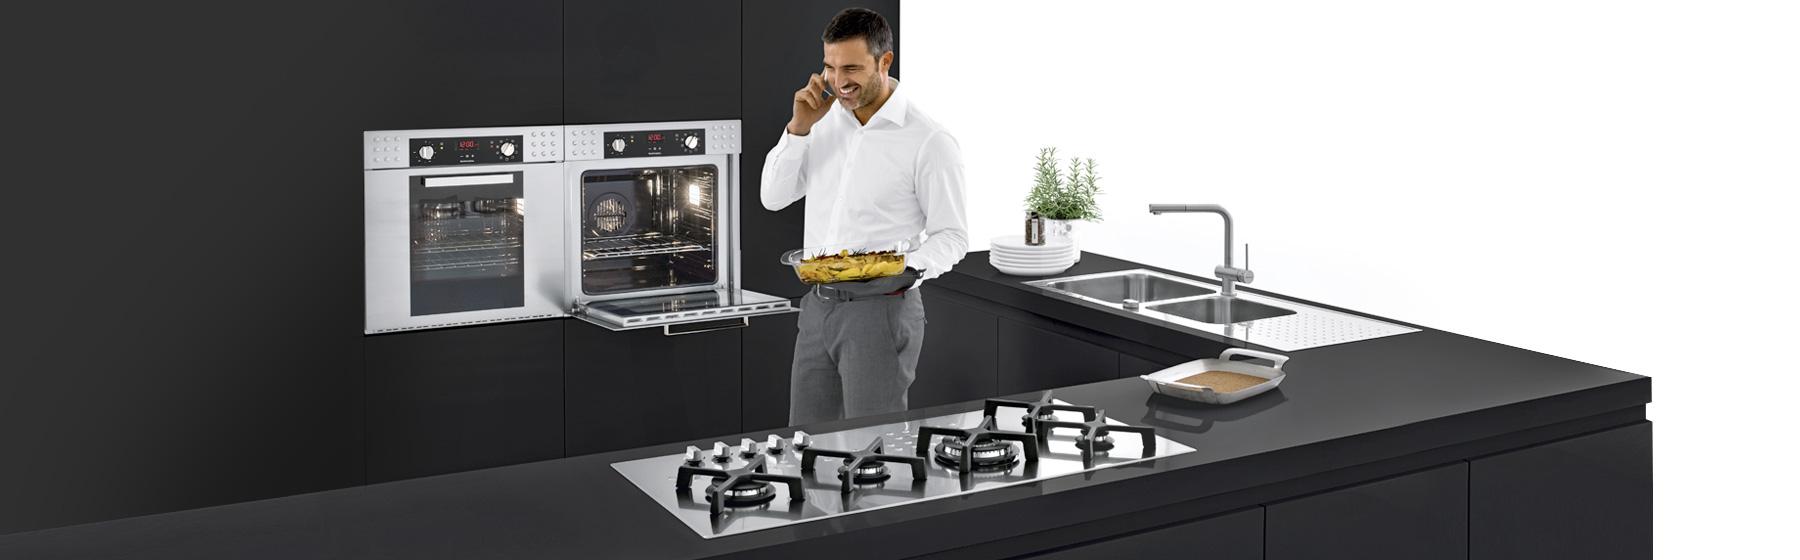 Casa moderna roma italy soluzioni cucina - Quiz sulla cucina ...